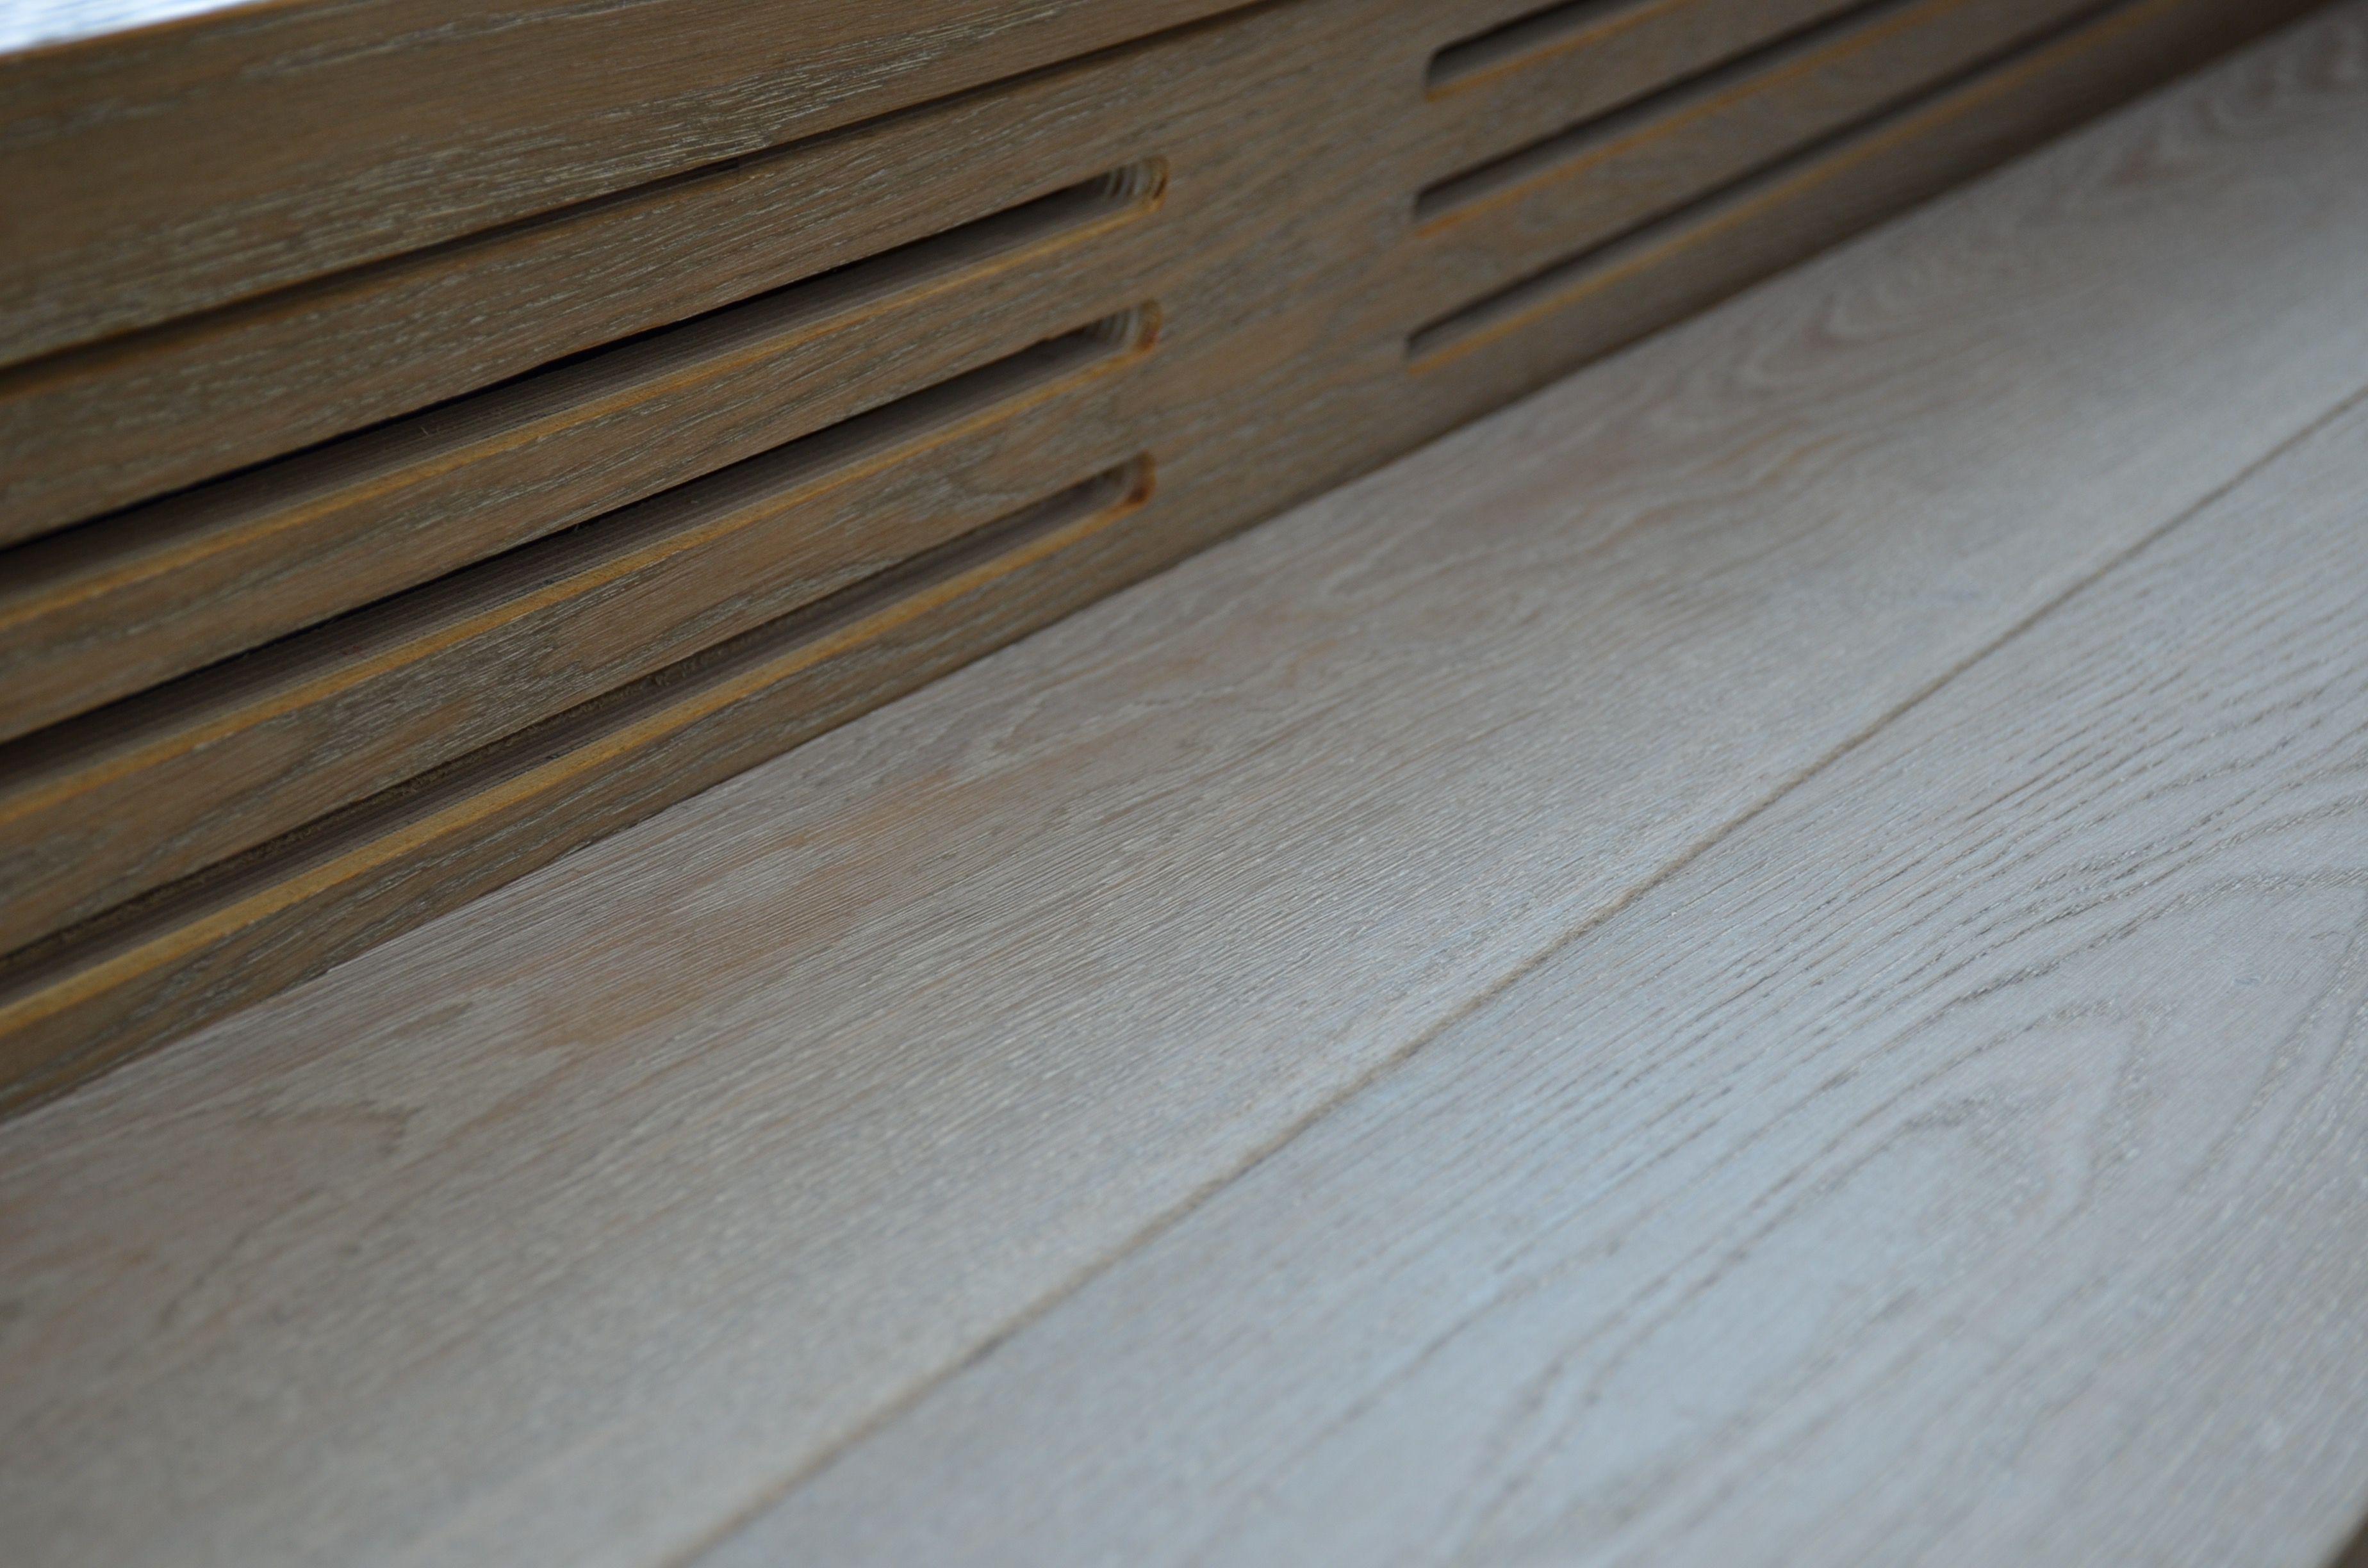 Best Bespoke Stair Treads And Air Vents In European Oak 400 x 300